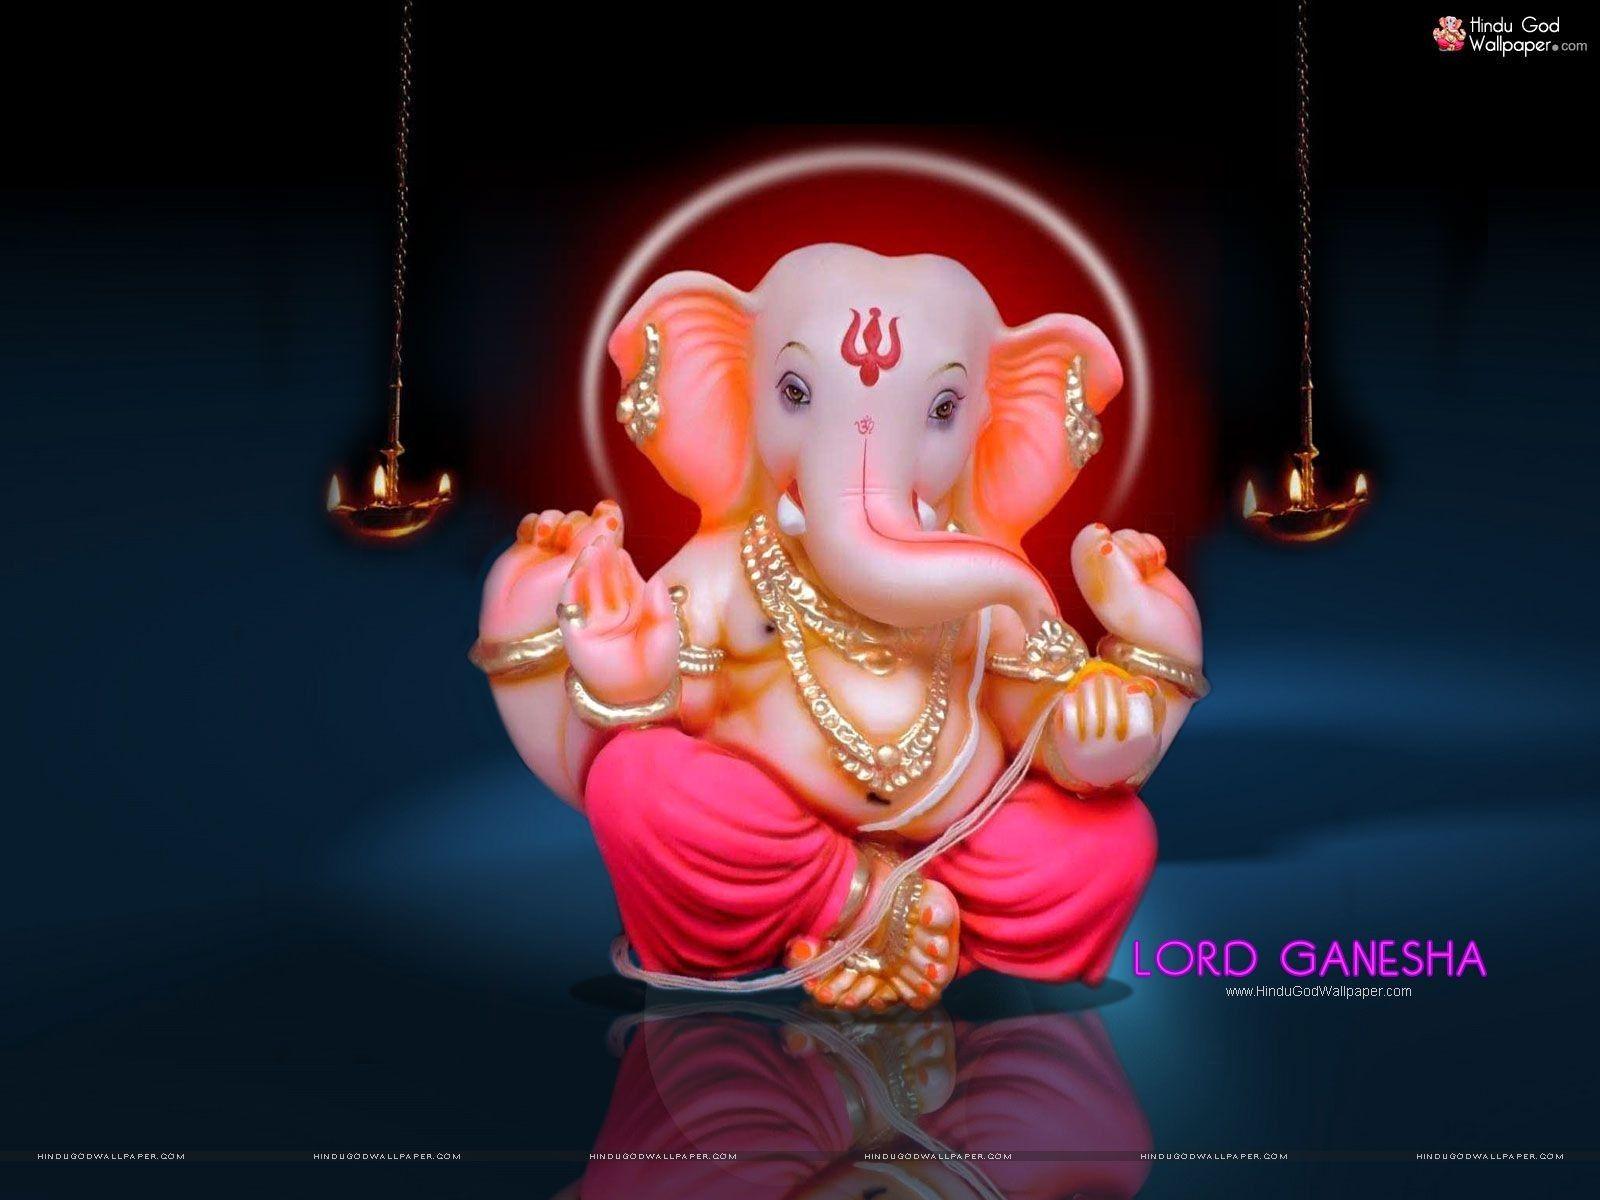 Awesome Ganesh Full Hd Wallpaper Ganesh Wallpaper Ganpati Bappa Wallpapers Ganesh Ganpati bappa hd wallpaper for laptop